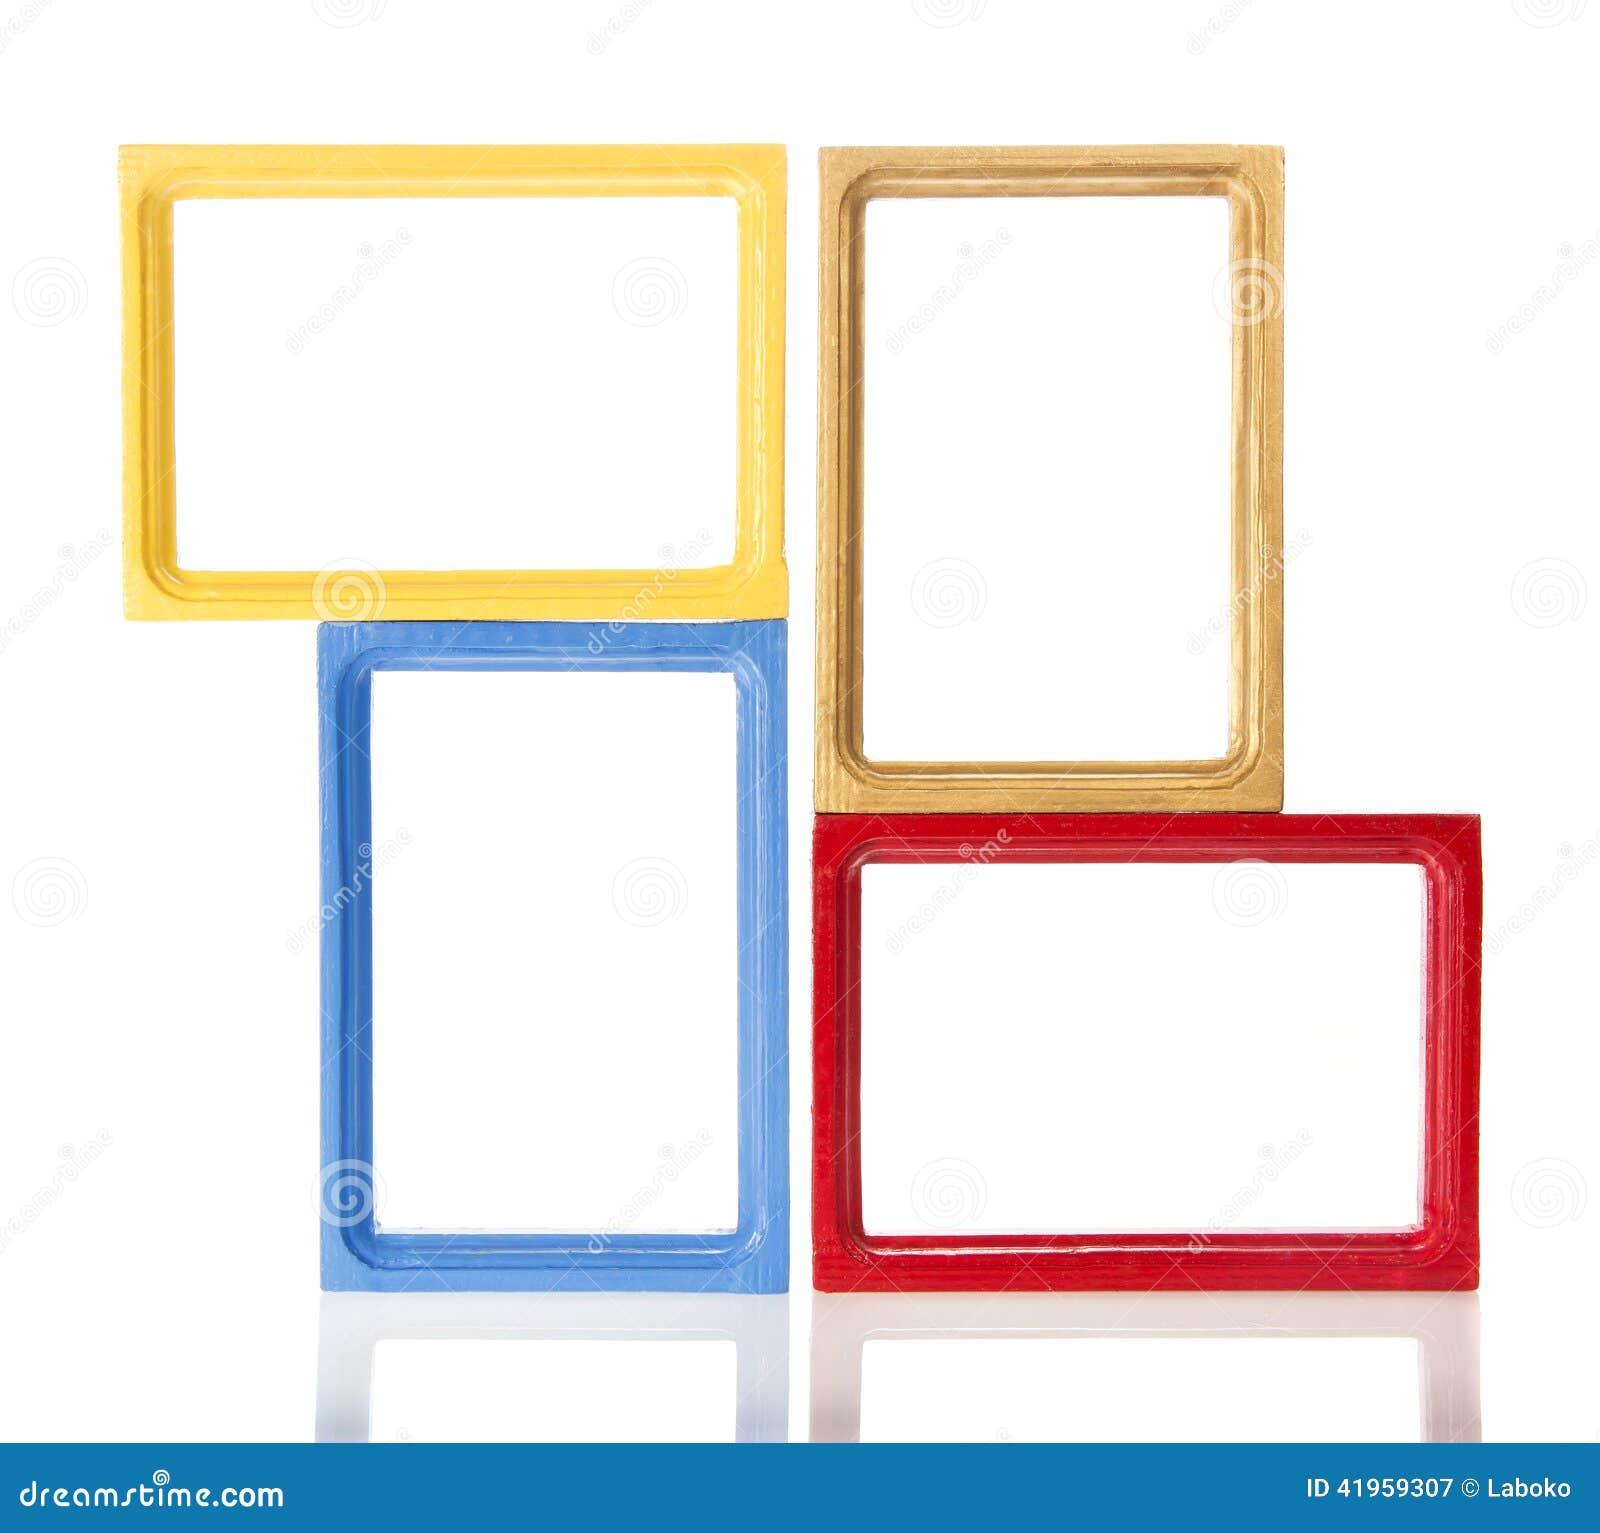 Set of four wooden framework for photo